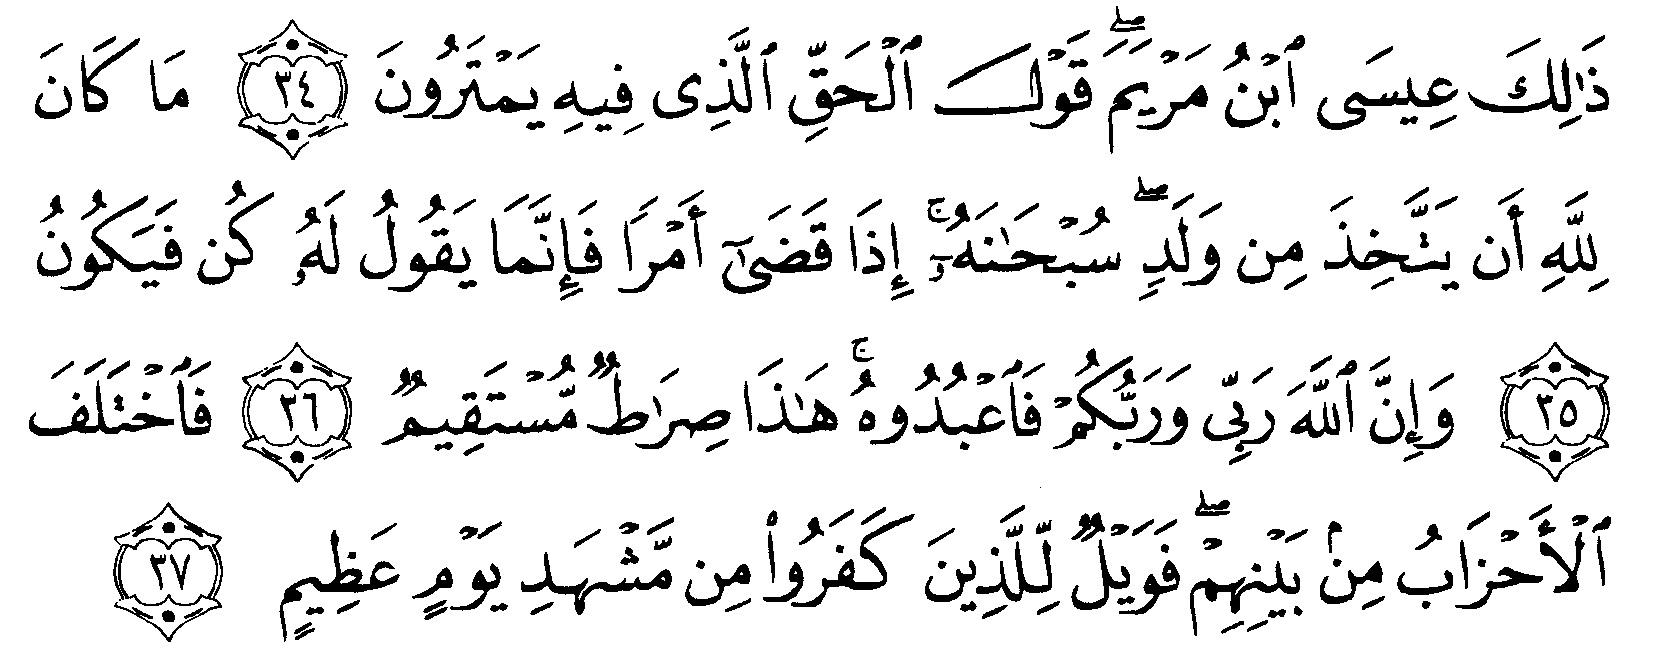 Tafsir Ibnu Katsir Surah Maryam Ayat 34 37 Alquranmulia